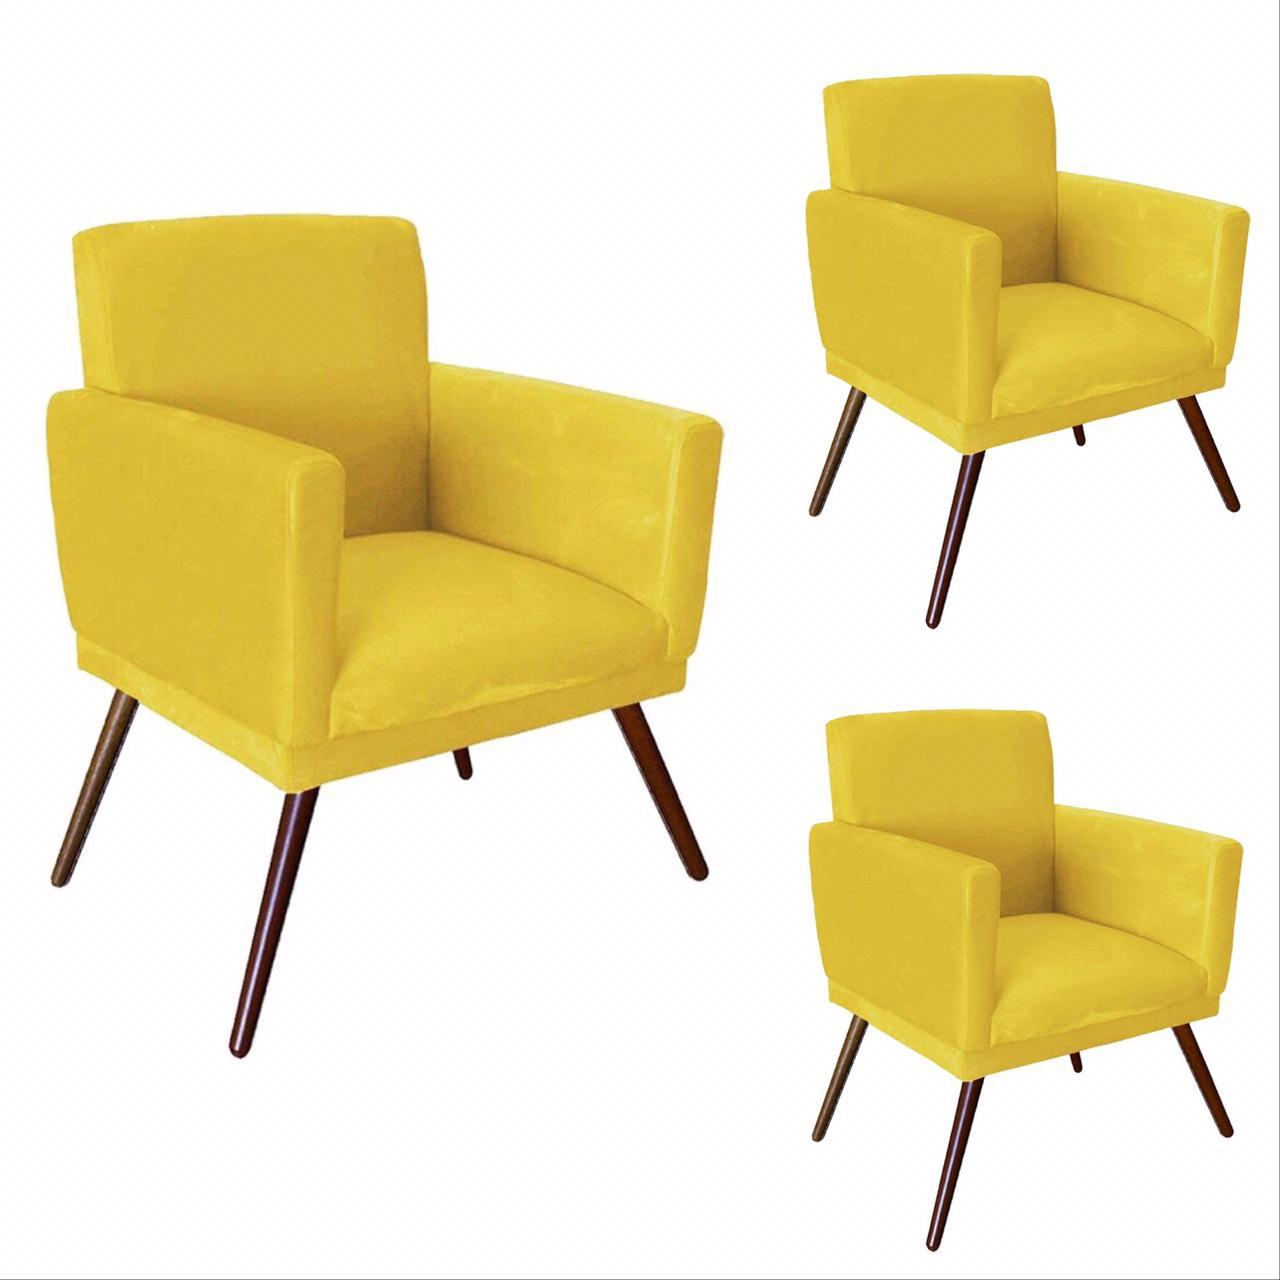 Kit 03 Poltrona Decorativa Nina com rodapé Amarelo - Bela Casa Shop